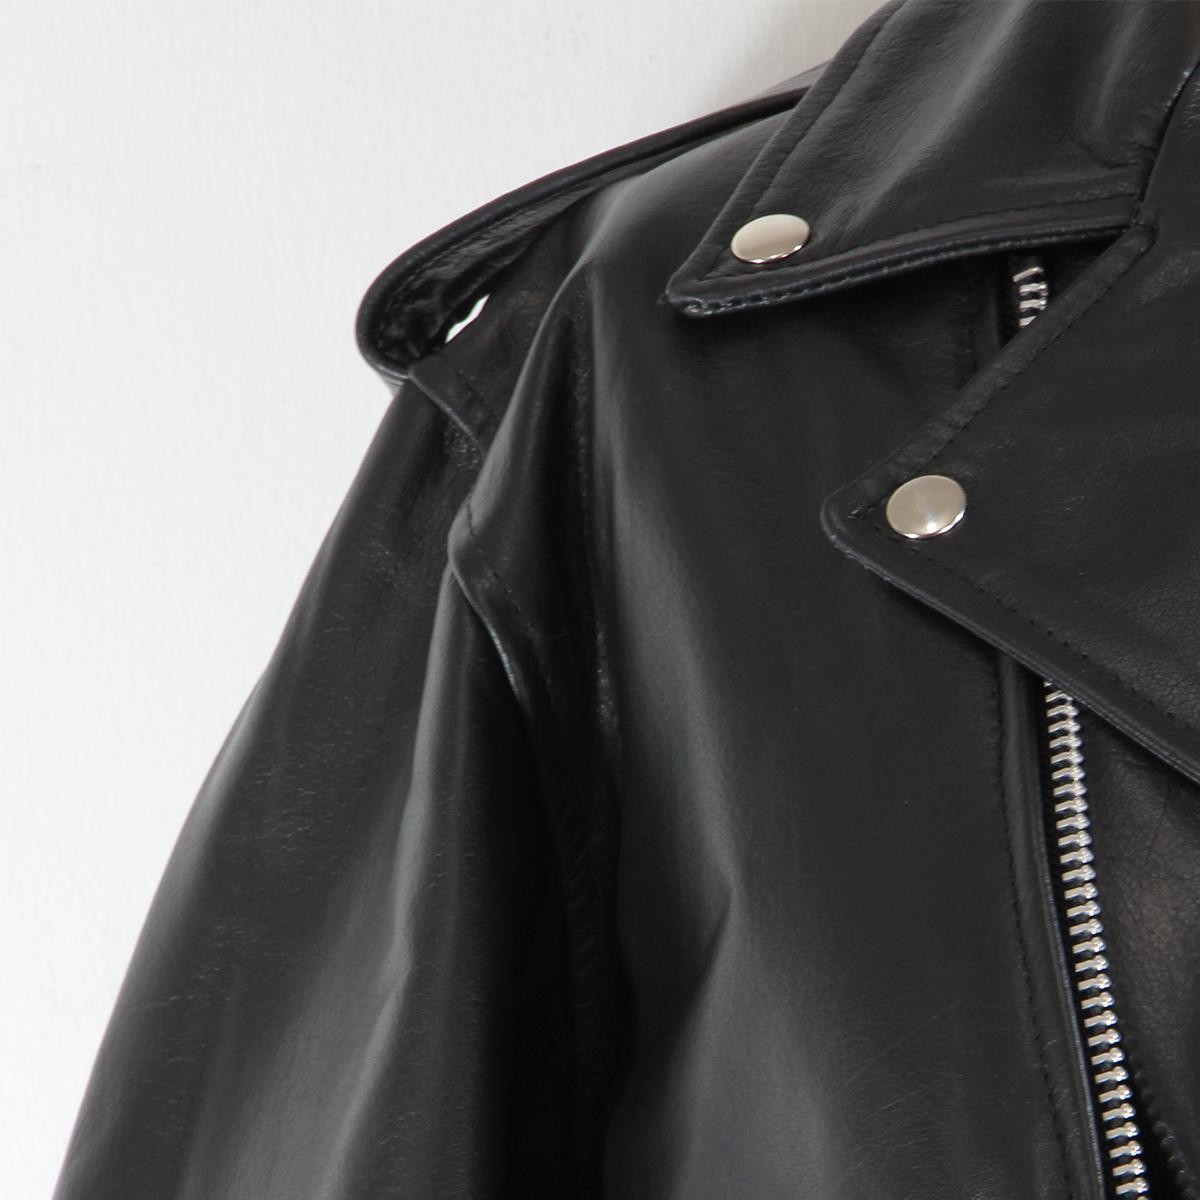 Black TOP GRADE Leather Motorcycle Biker Jacket 3